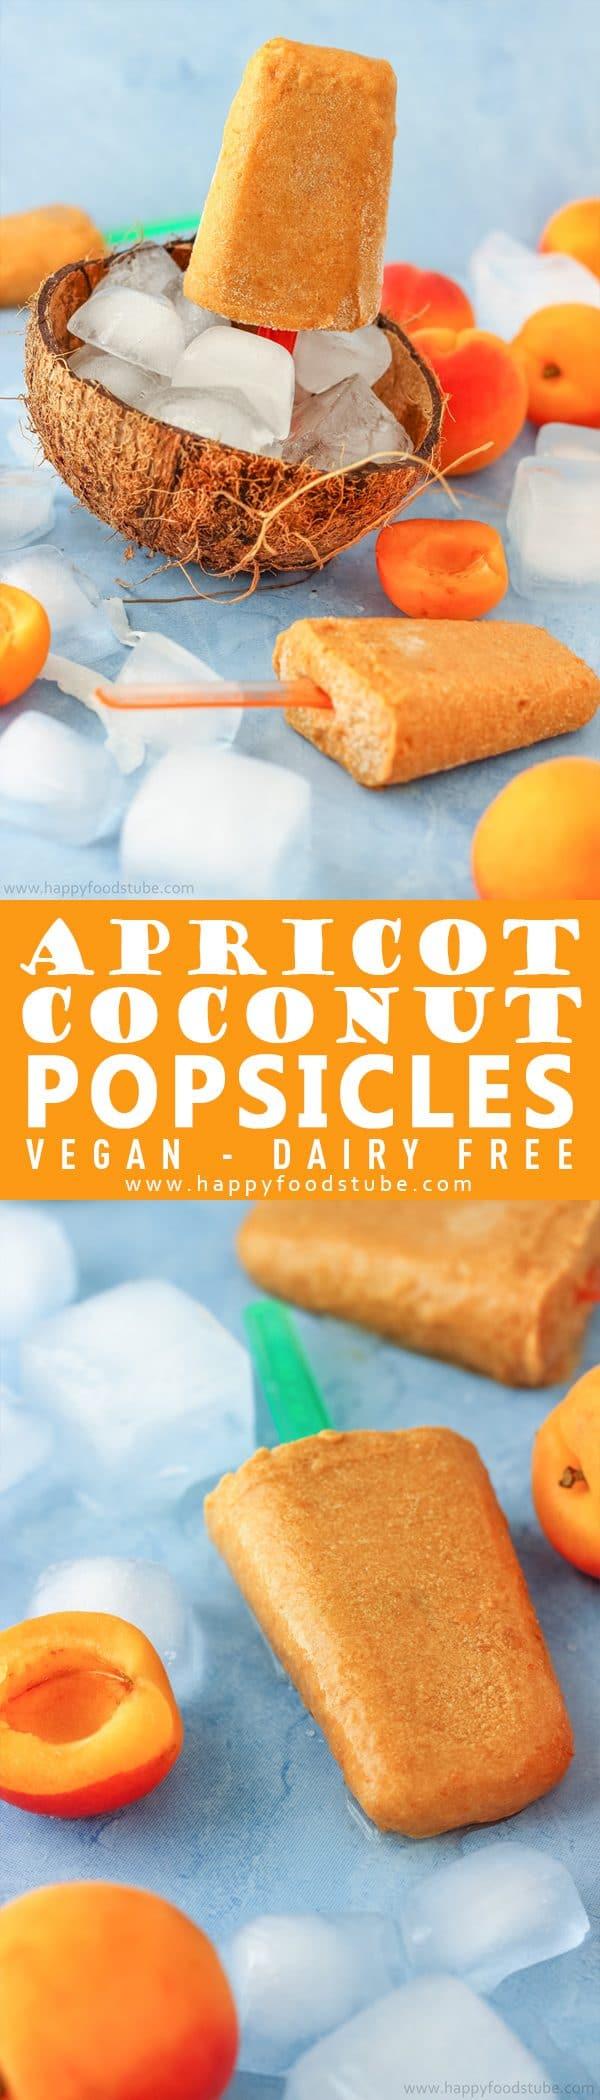 Apricot Coconut Popsicles Recipe Picture